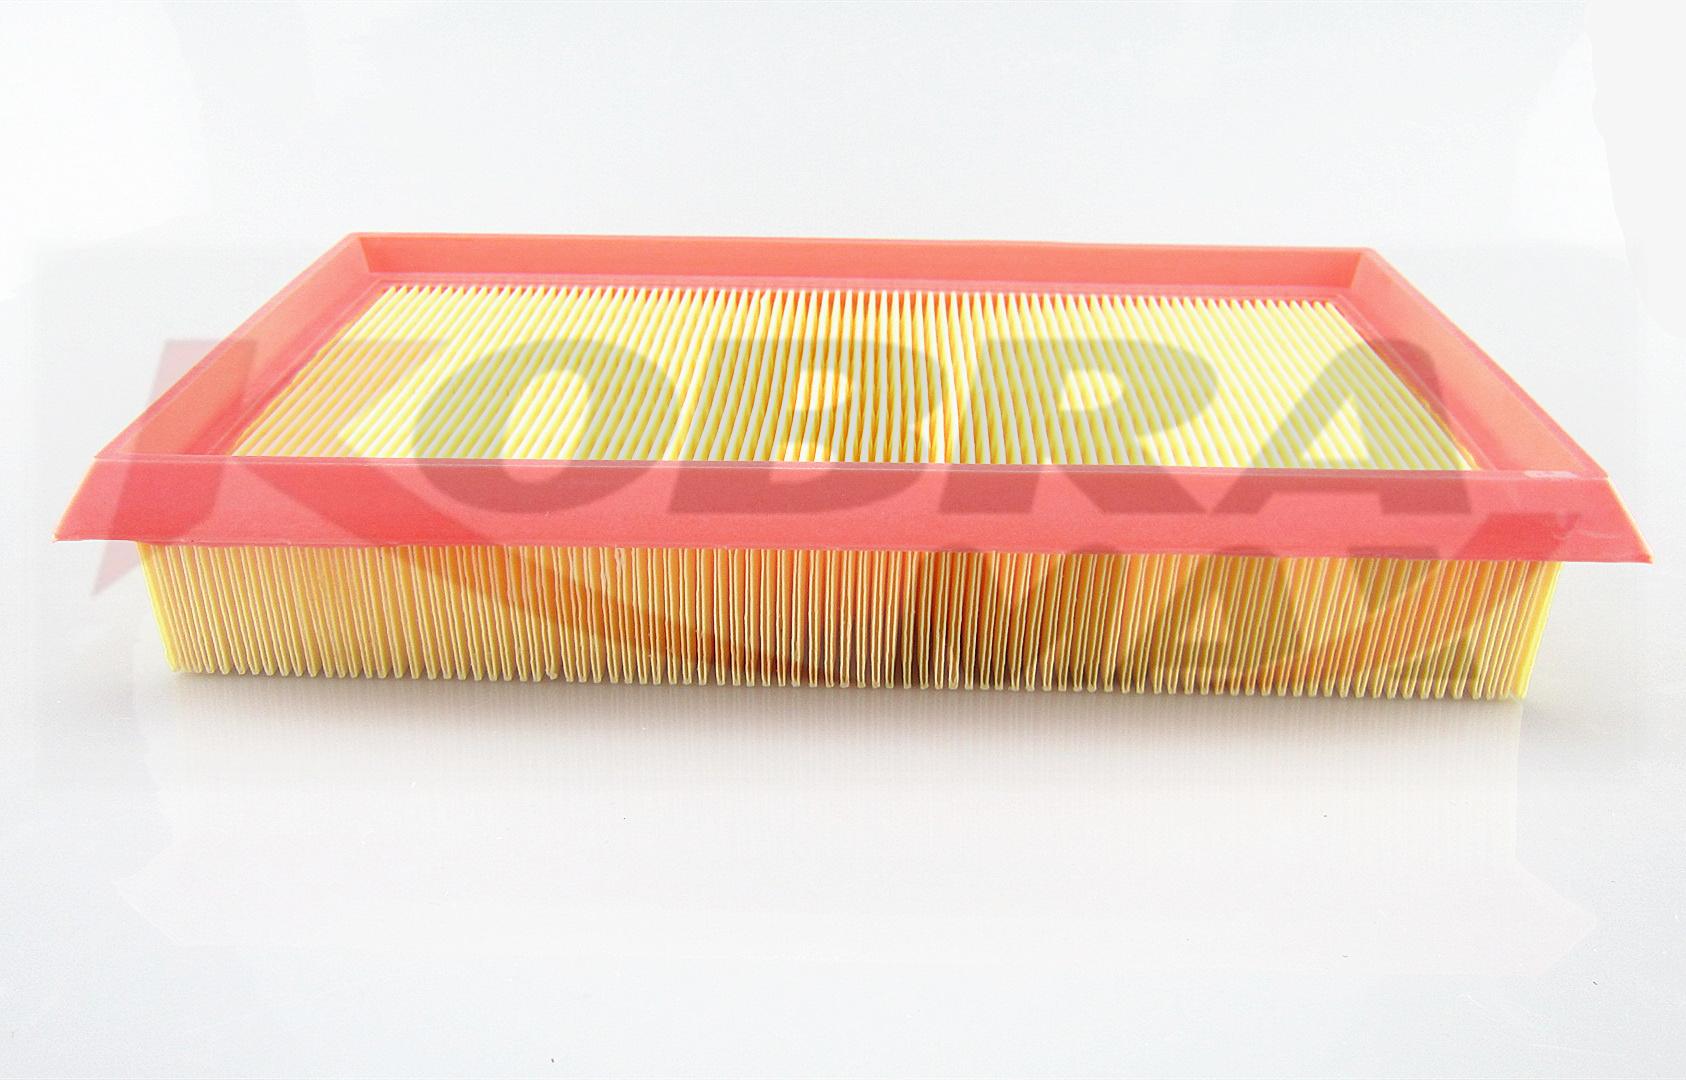 KOBRA-MAX AIR FILTER 7701047417